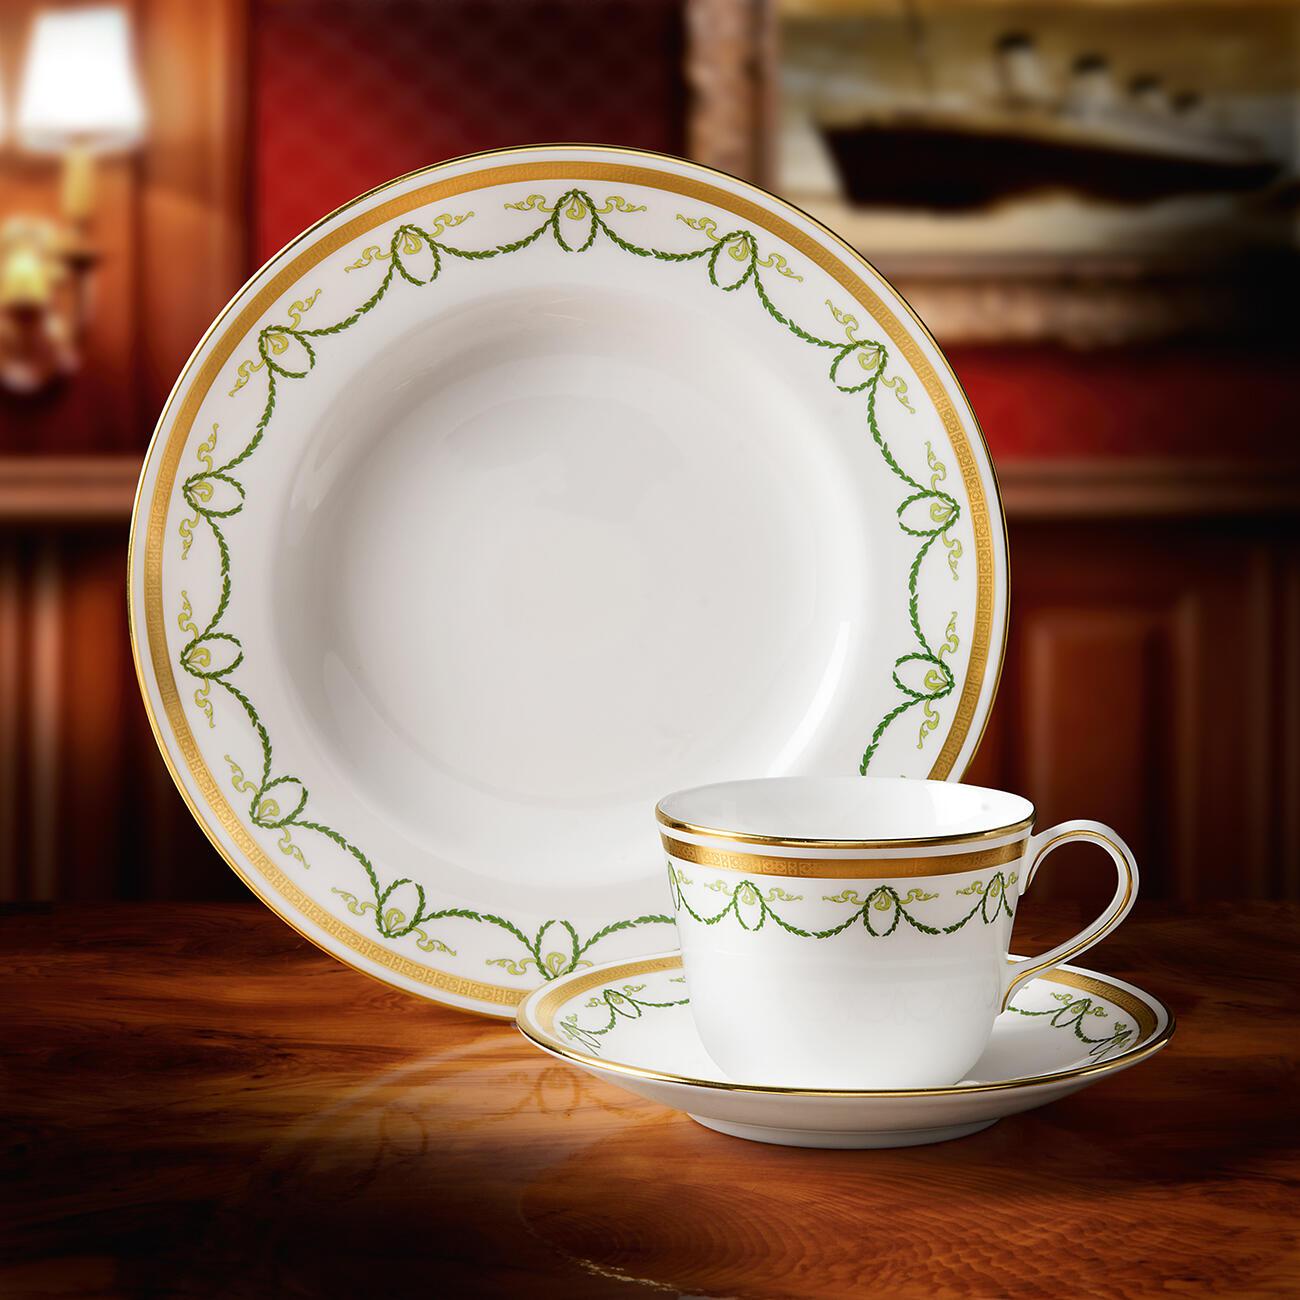 titanic collection 3 jahre garantie pro idee. Black Bedroom Furniture Sets. Home Design Ideas